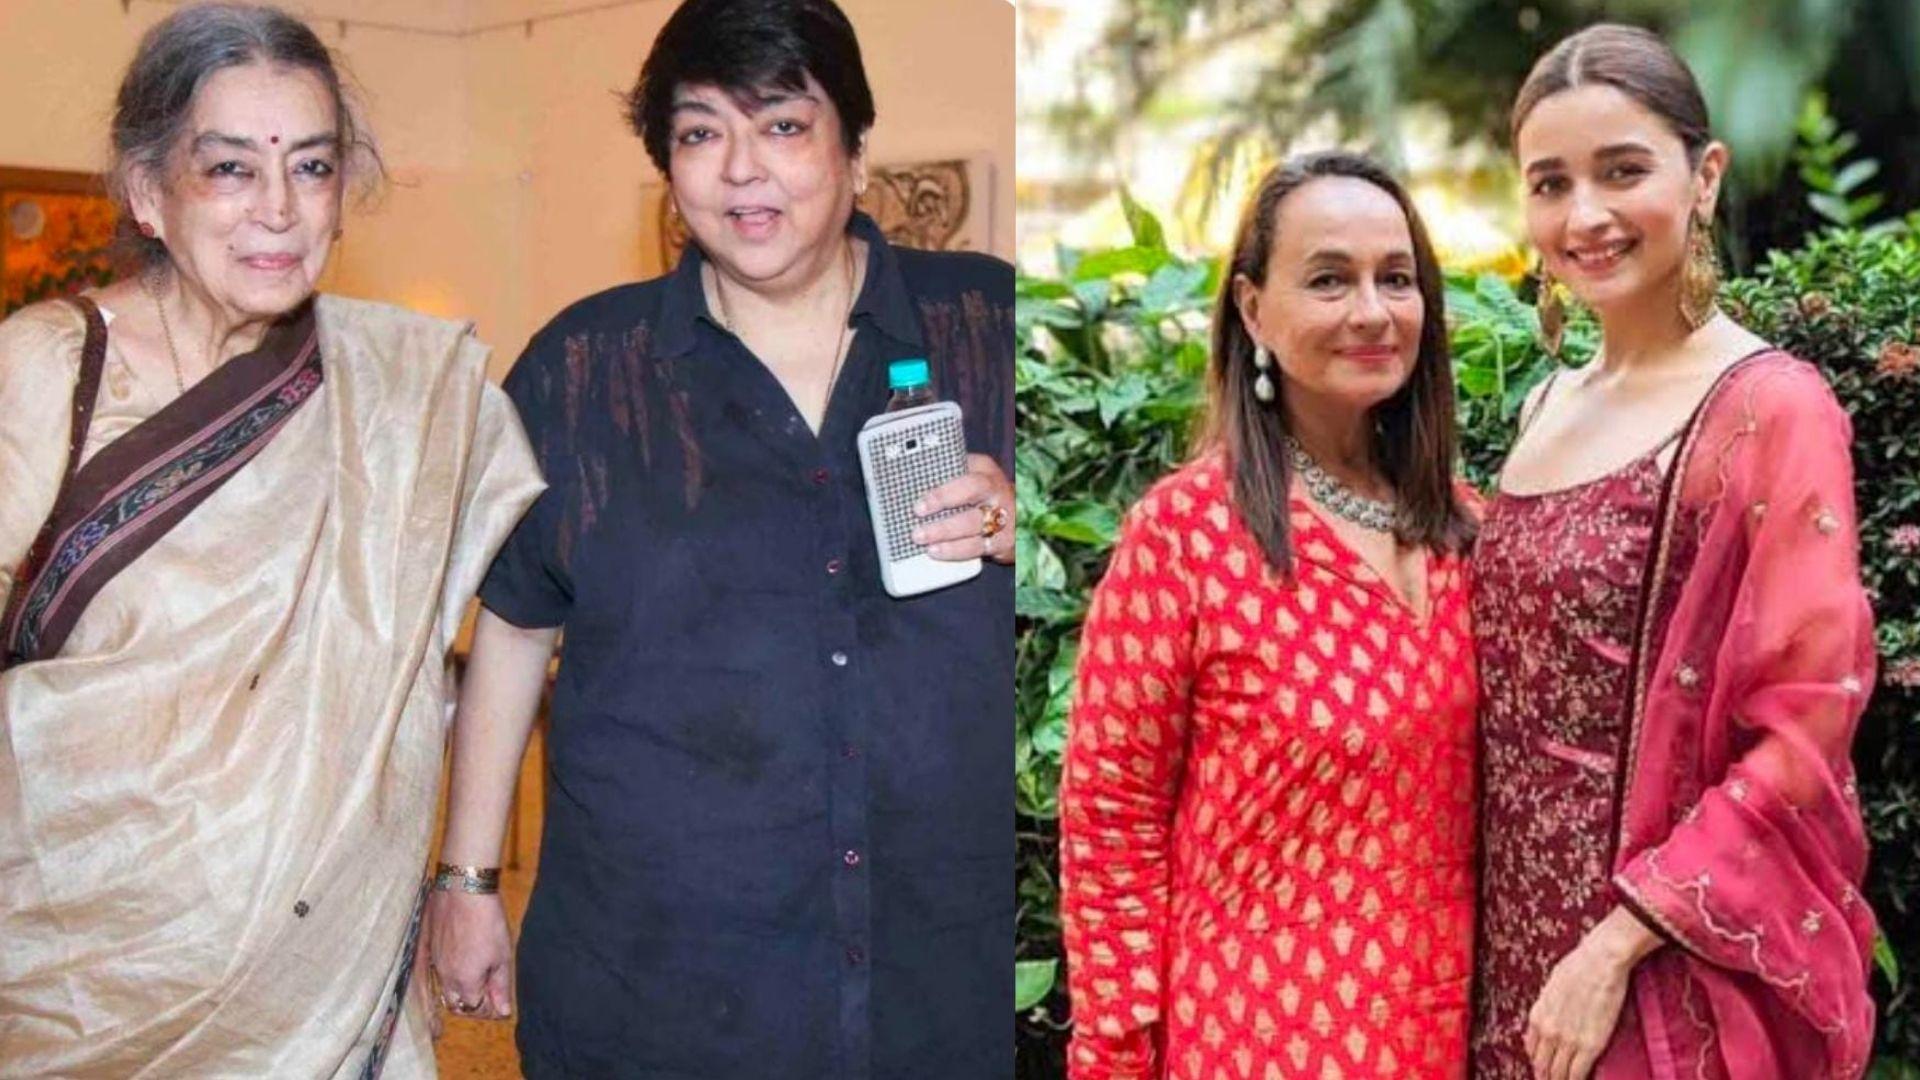 Late Filmmaker Kalpana Lajmi's Mother Lalitha Lajmi Opens-up On Soni Razdan And Alia Bhatt's Financial Help